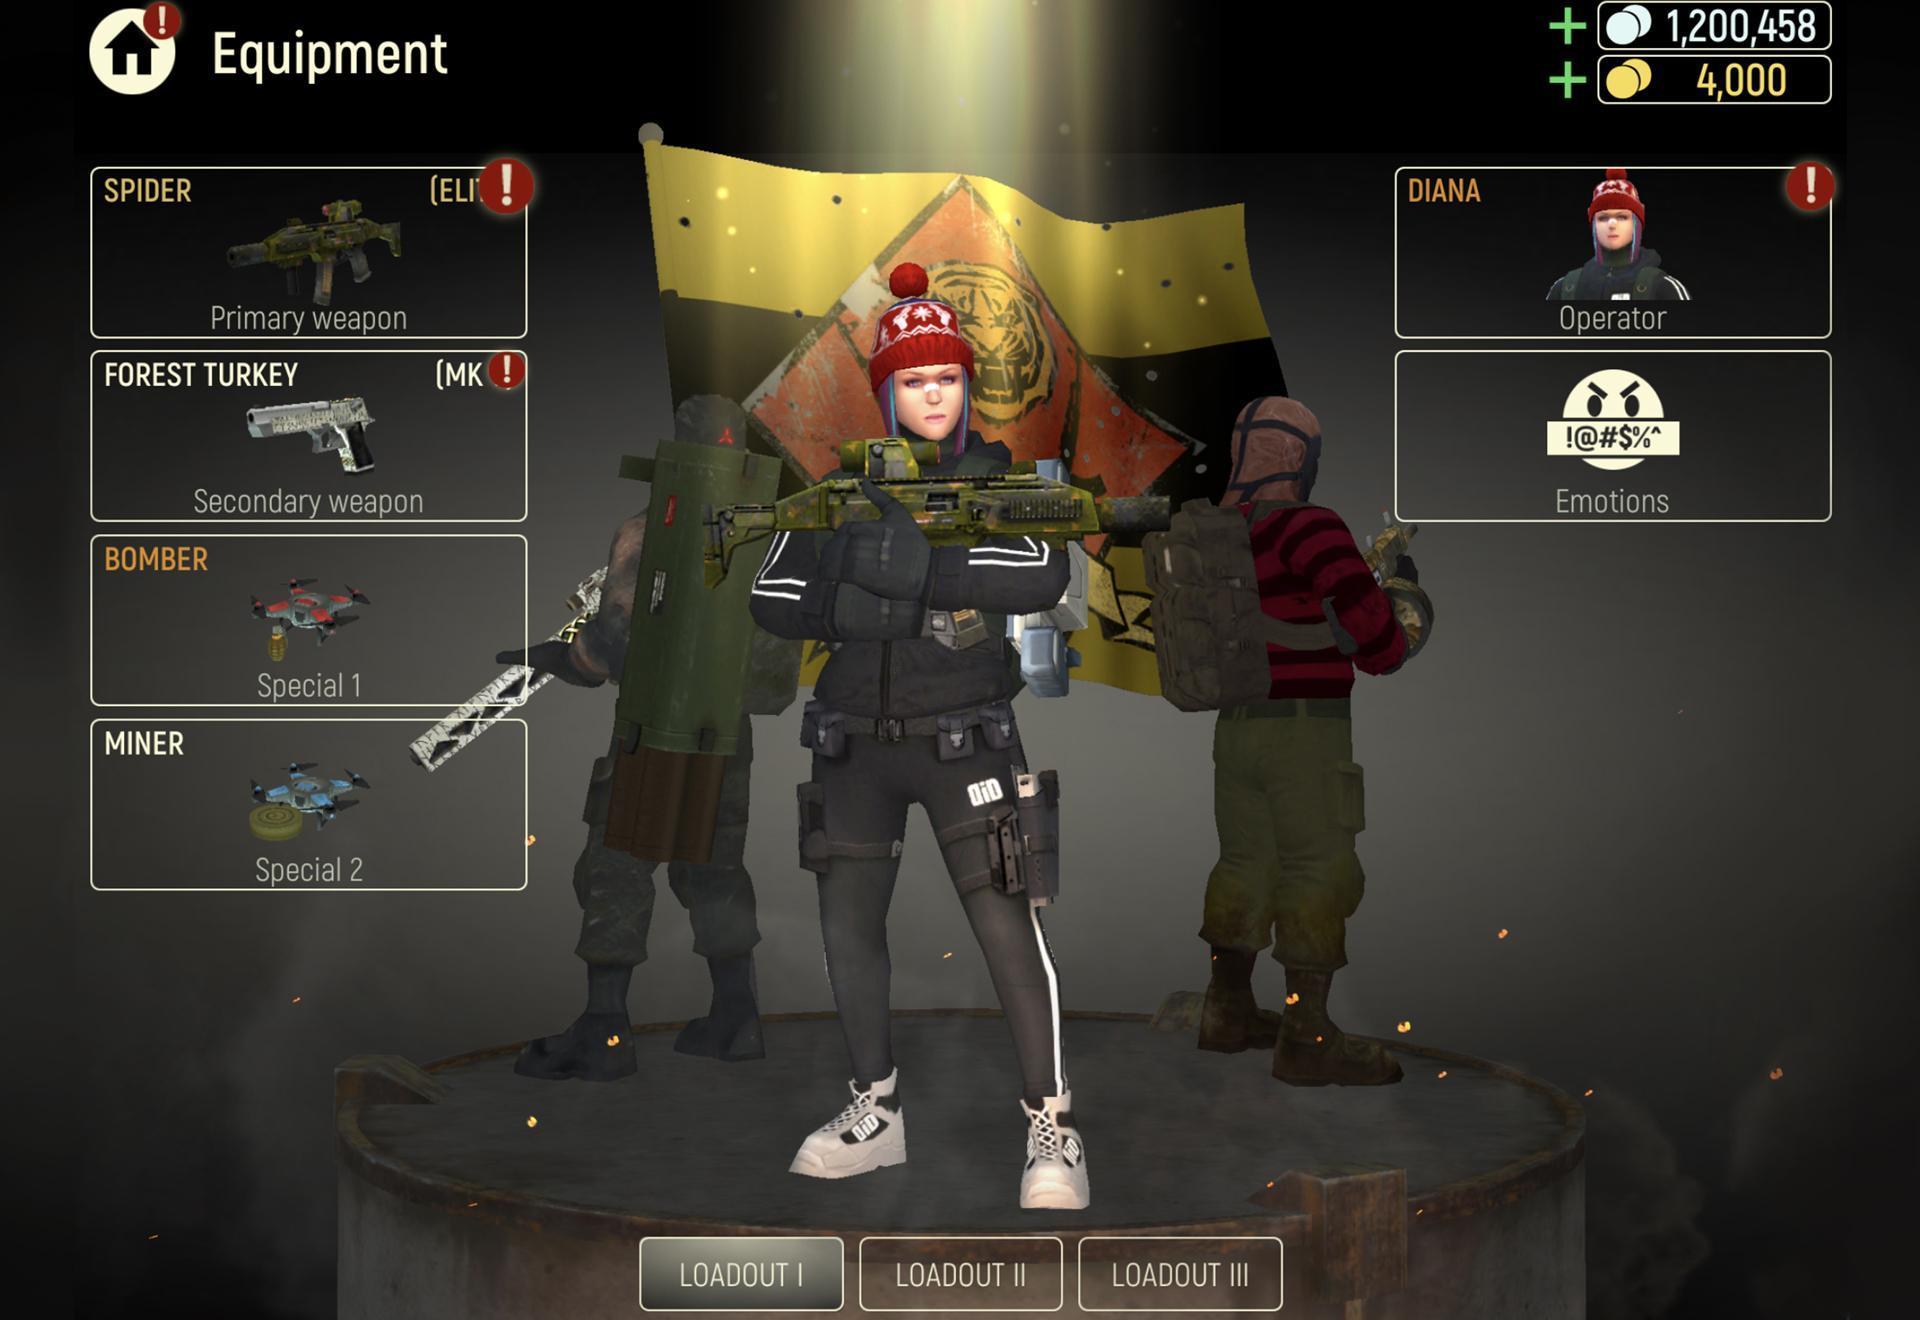 Tacticool 5v5 shooter 1.31.0 Screenshot 6